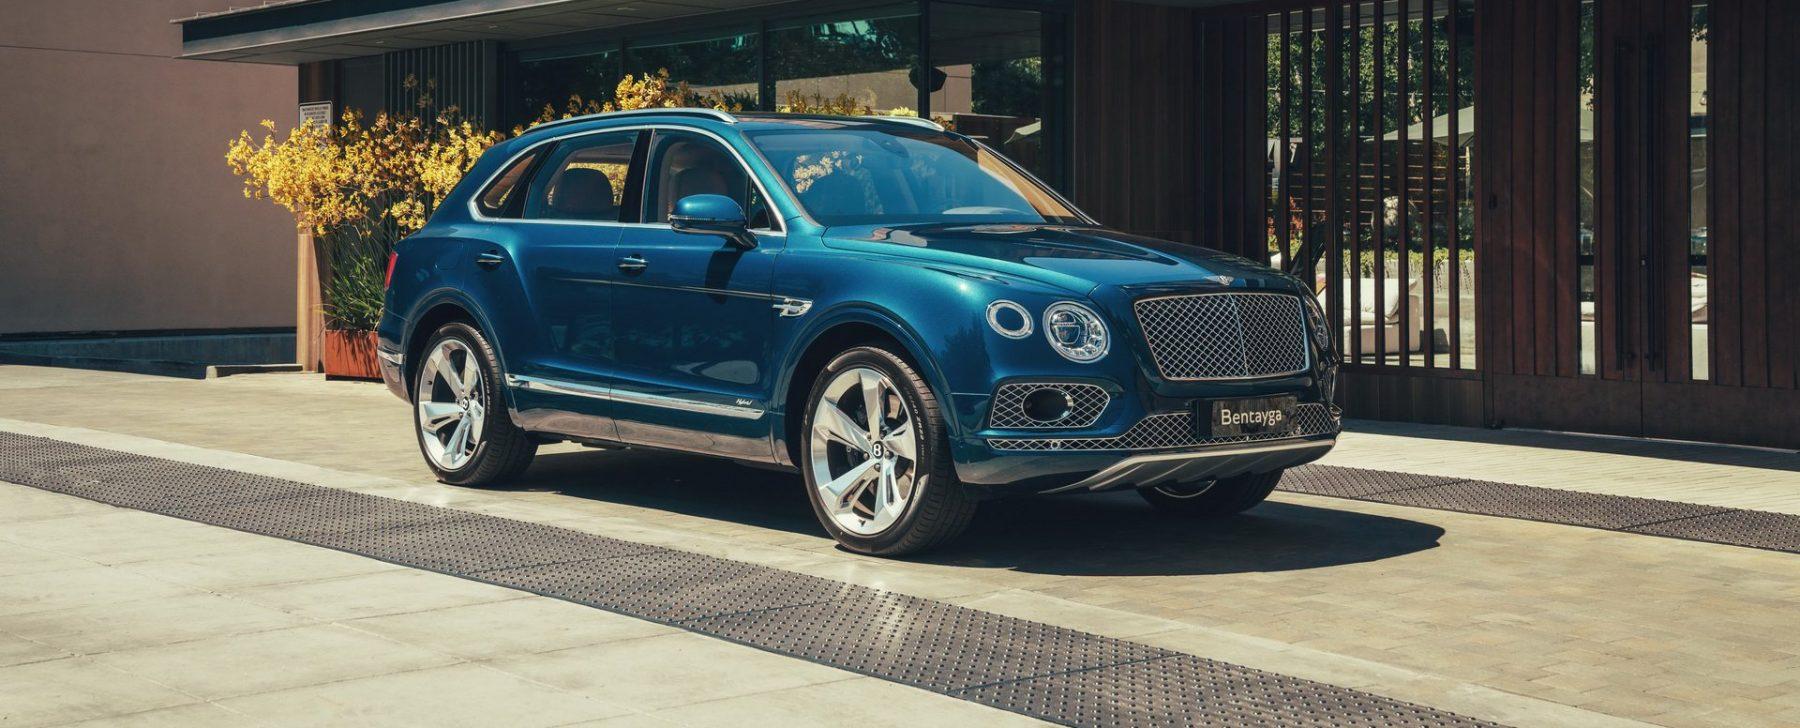 Bentley Bentayga hibrido